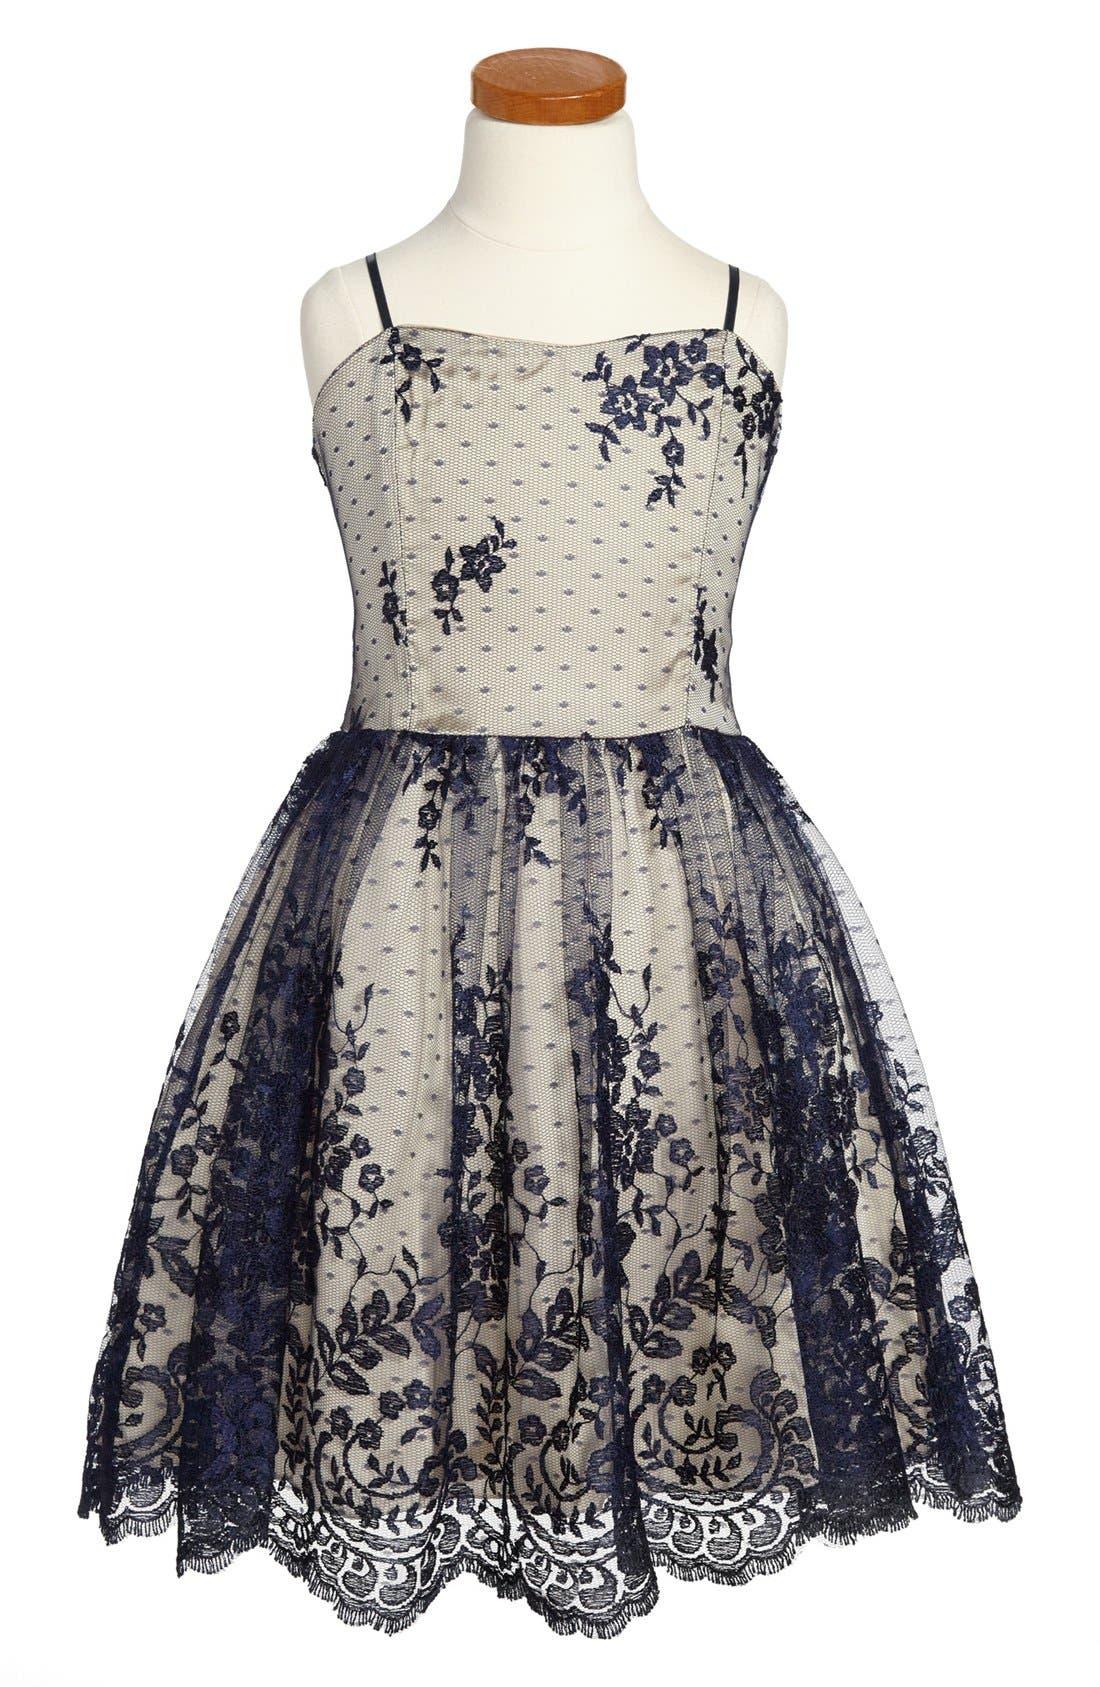 Alternate Image 1 Selected - Un Deux Trois Lace Overlay Dress (Big Girls)